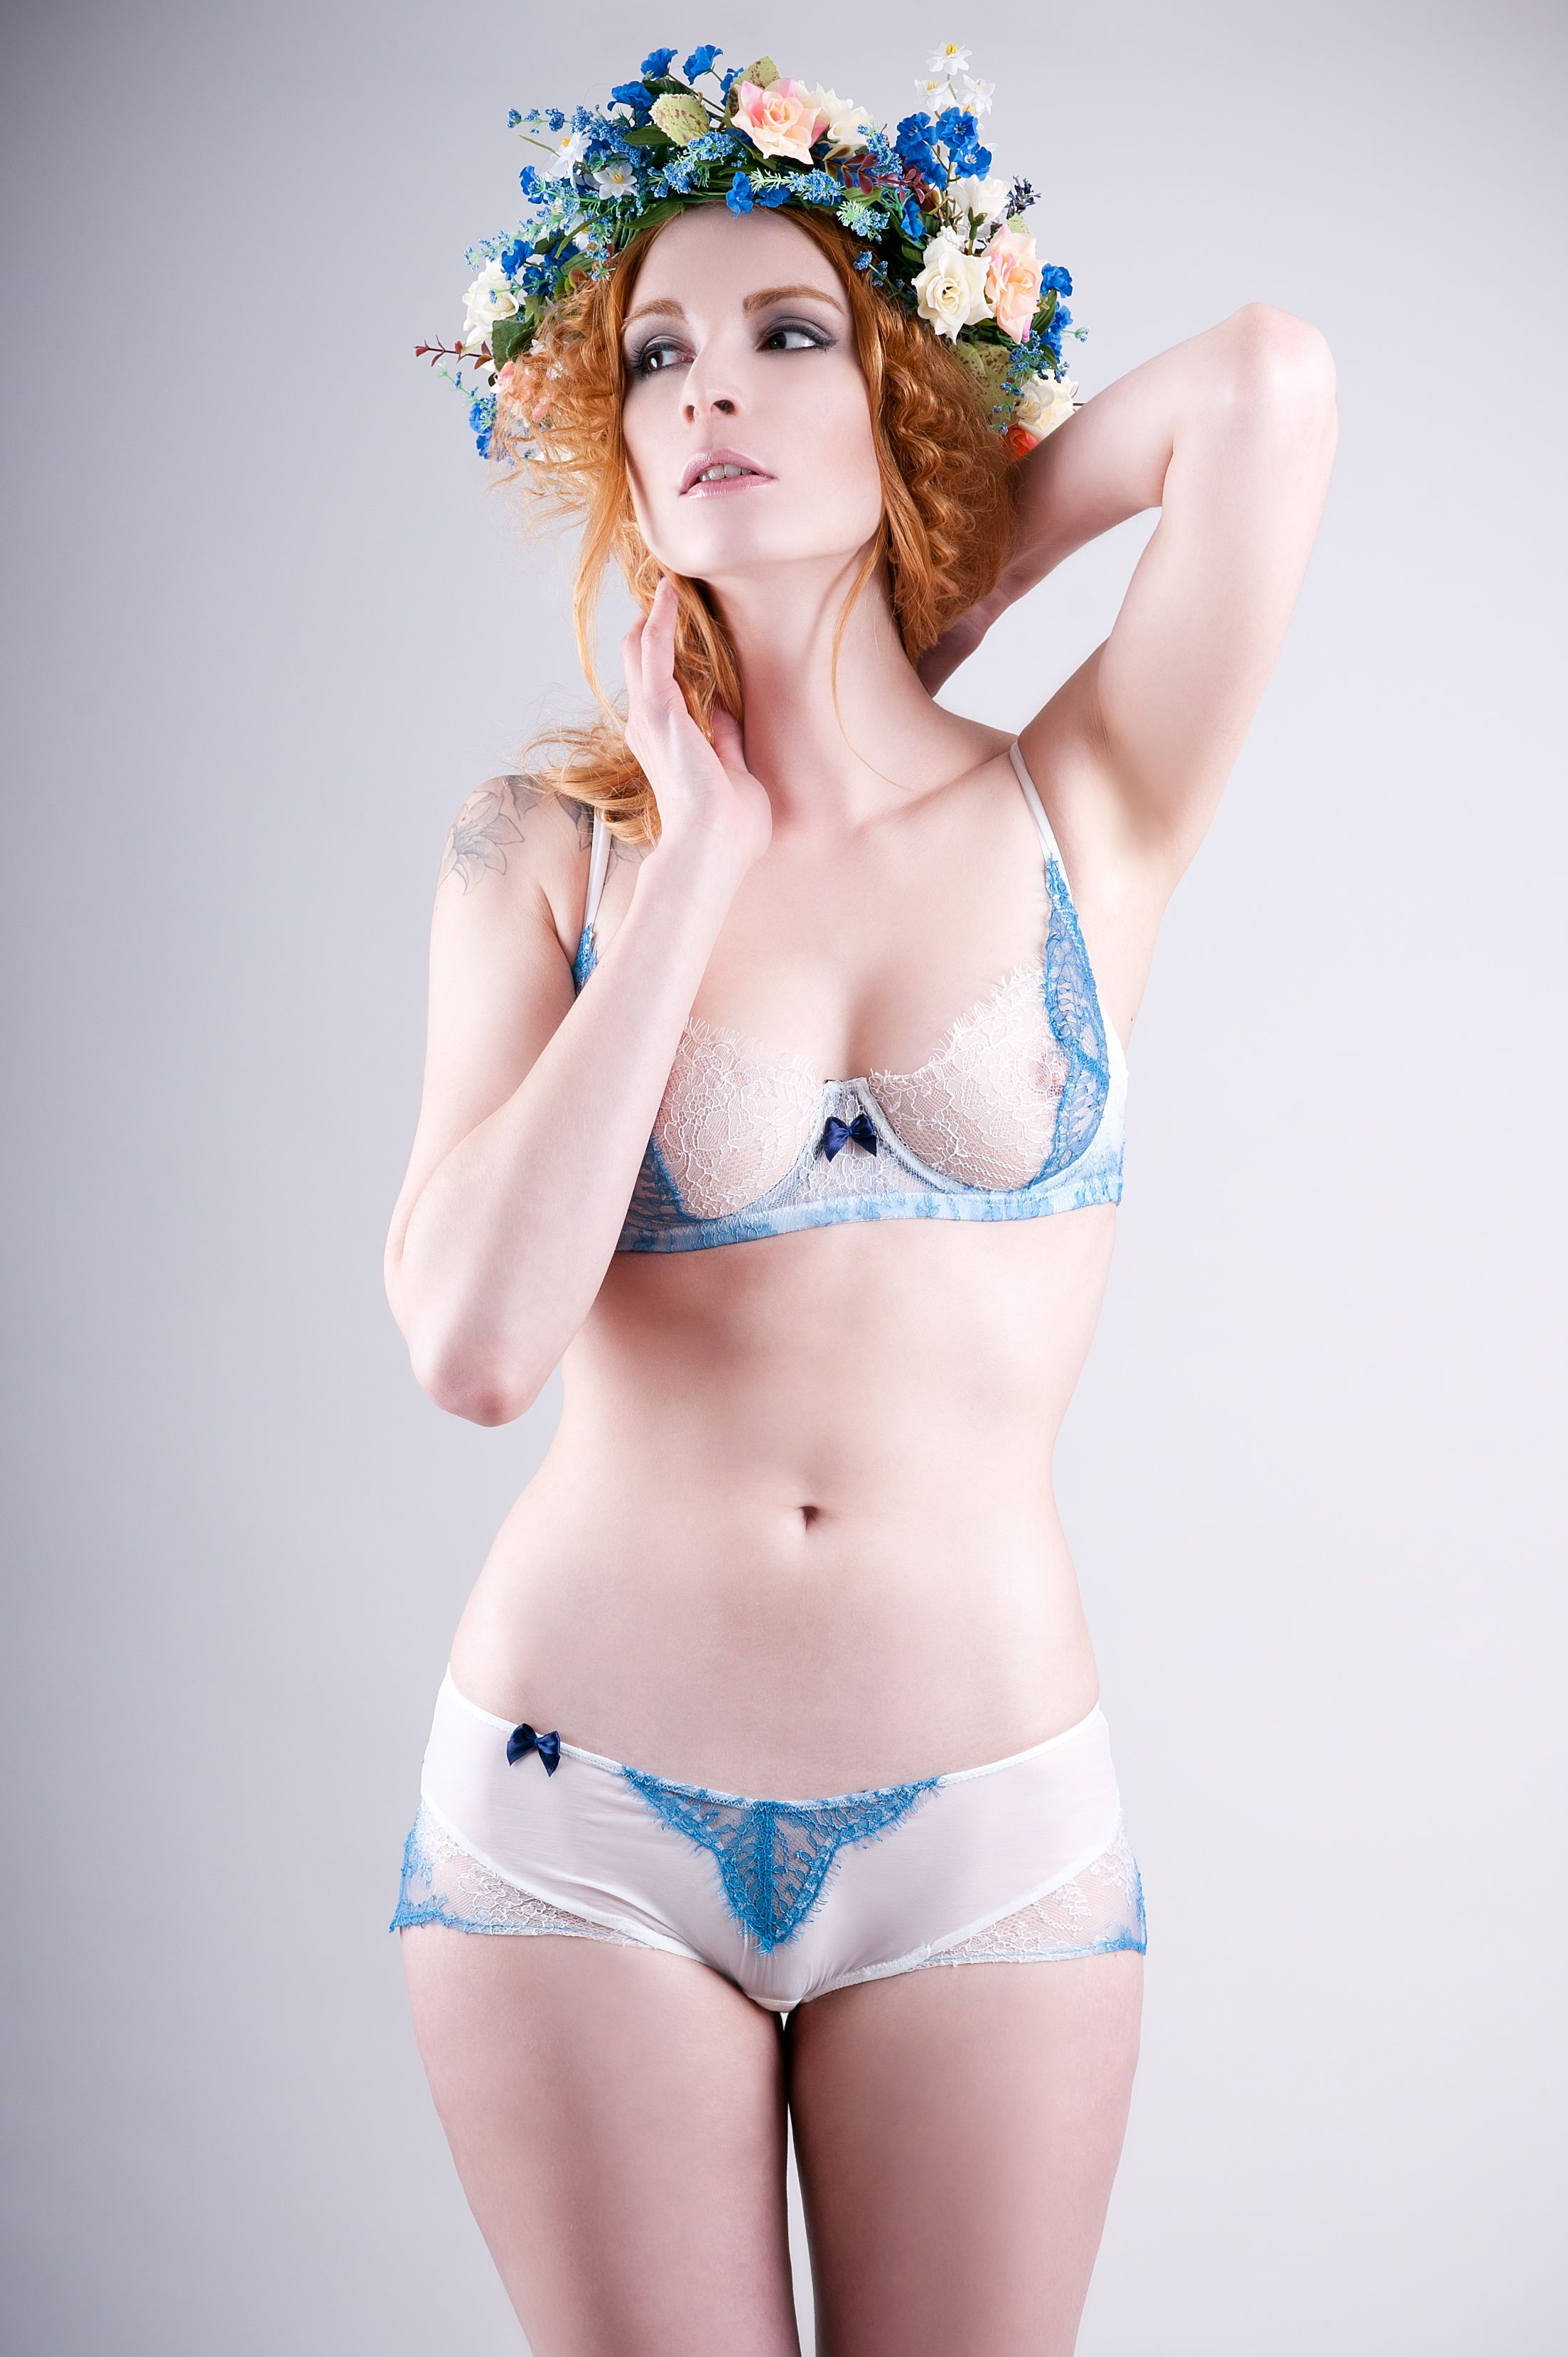 lost lingerie wonderland bra through fragile excessive charming burlesque lady bikinis material sheer